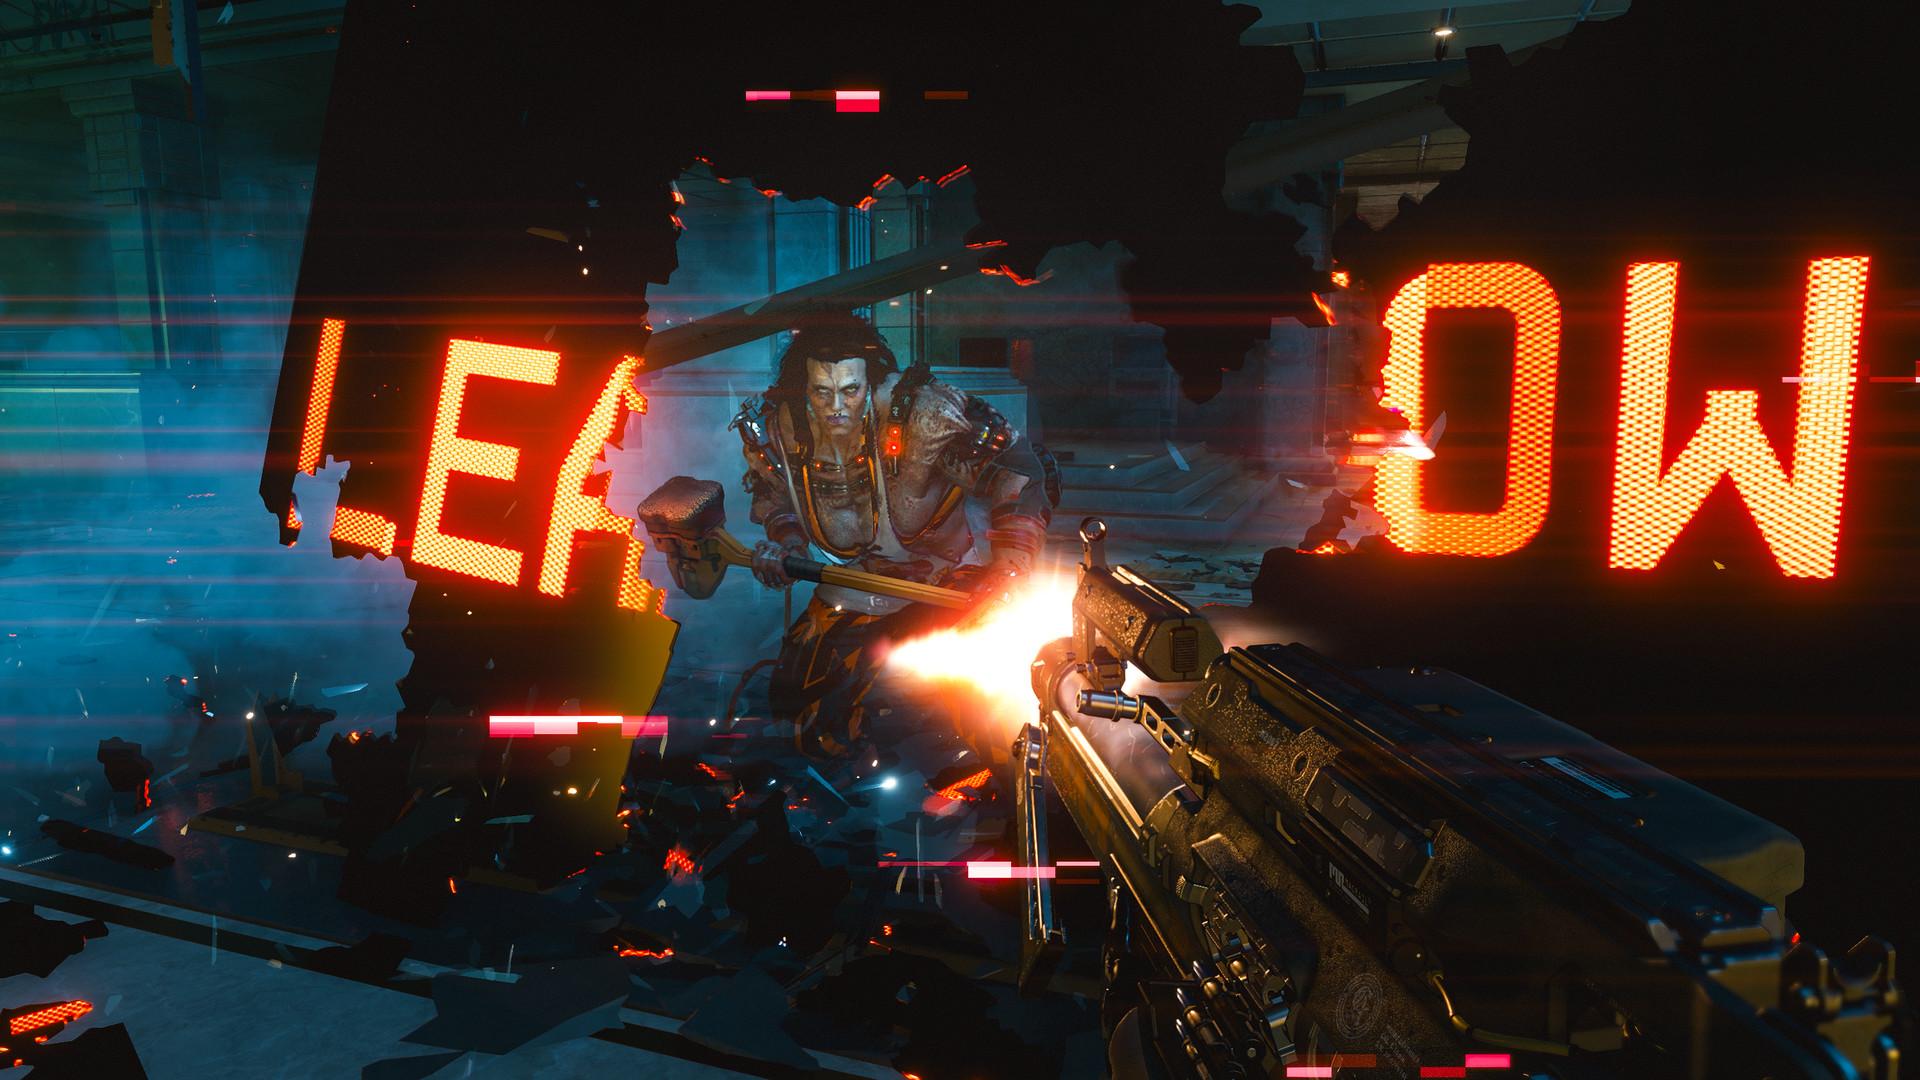 Processo contra CD Projekt RED e Cyberpunk 2077 avança mesmo